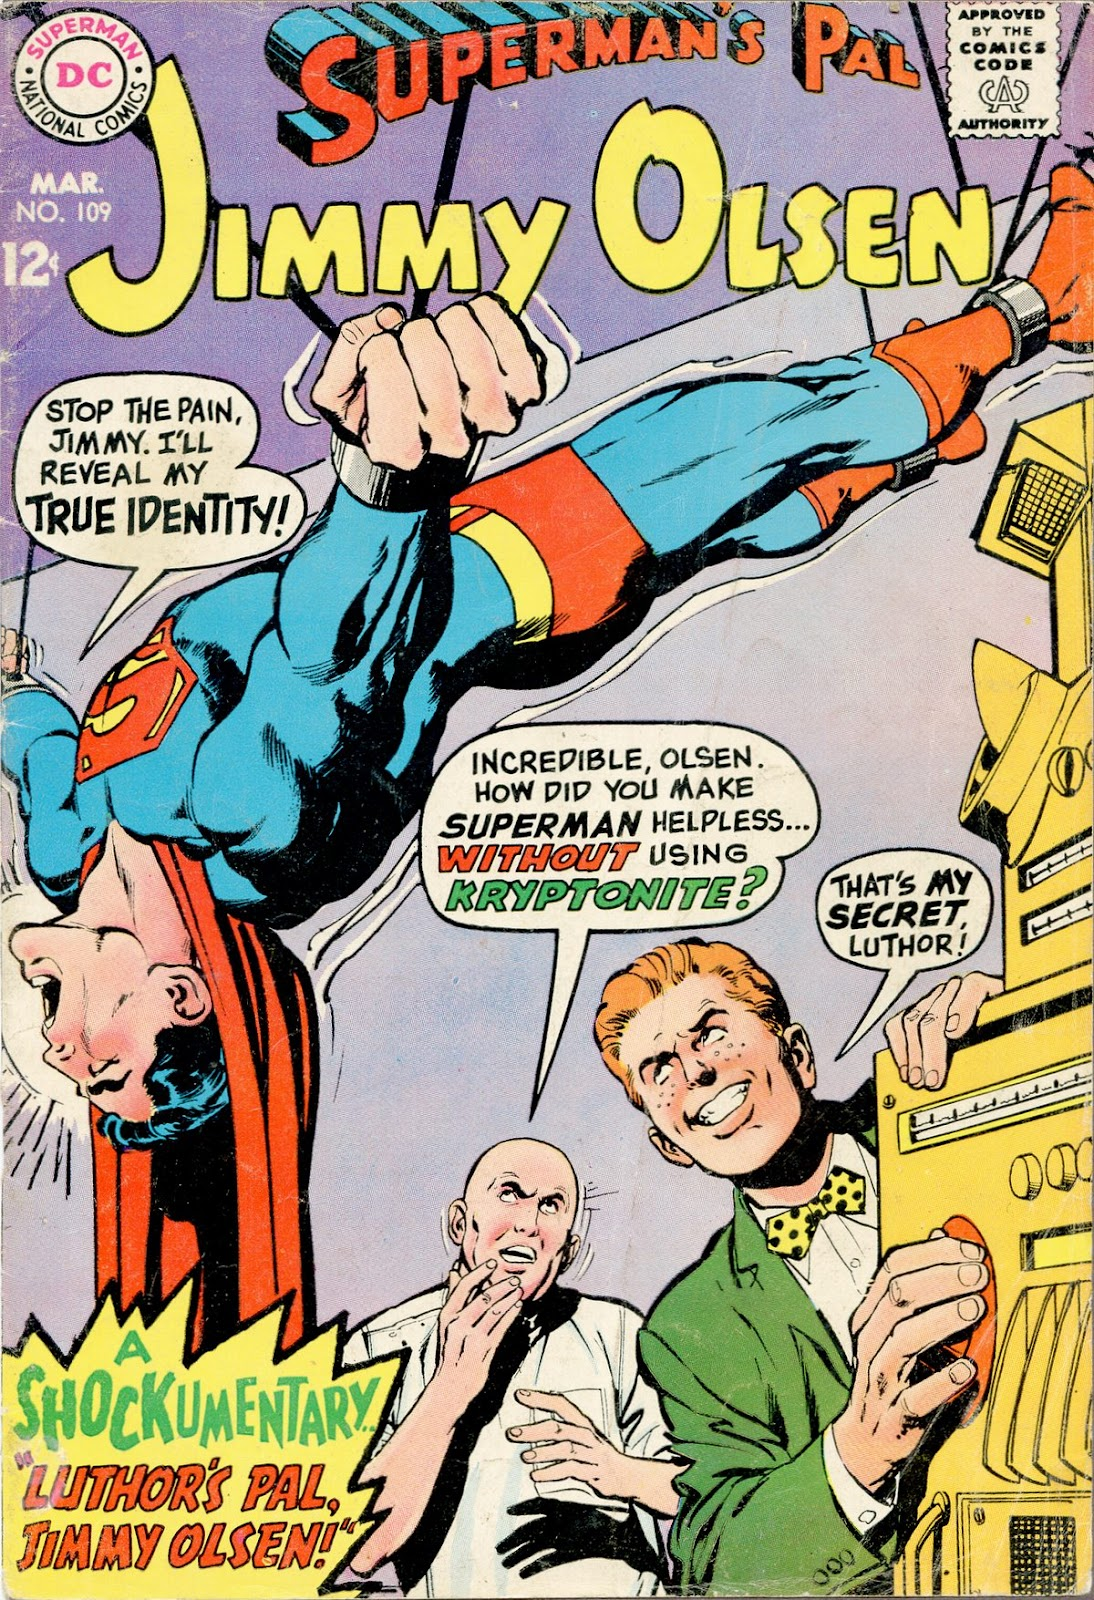 Supermans Pal Jimmy Olsen (1954) 109 Page 1